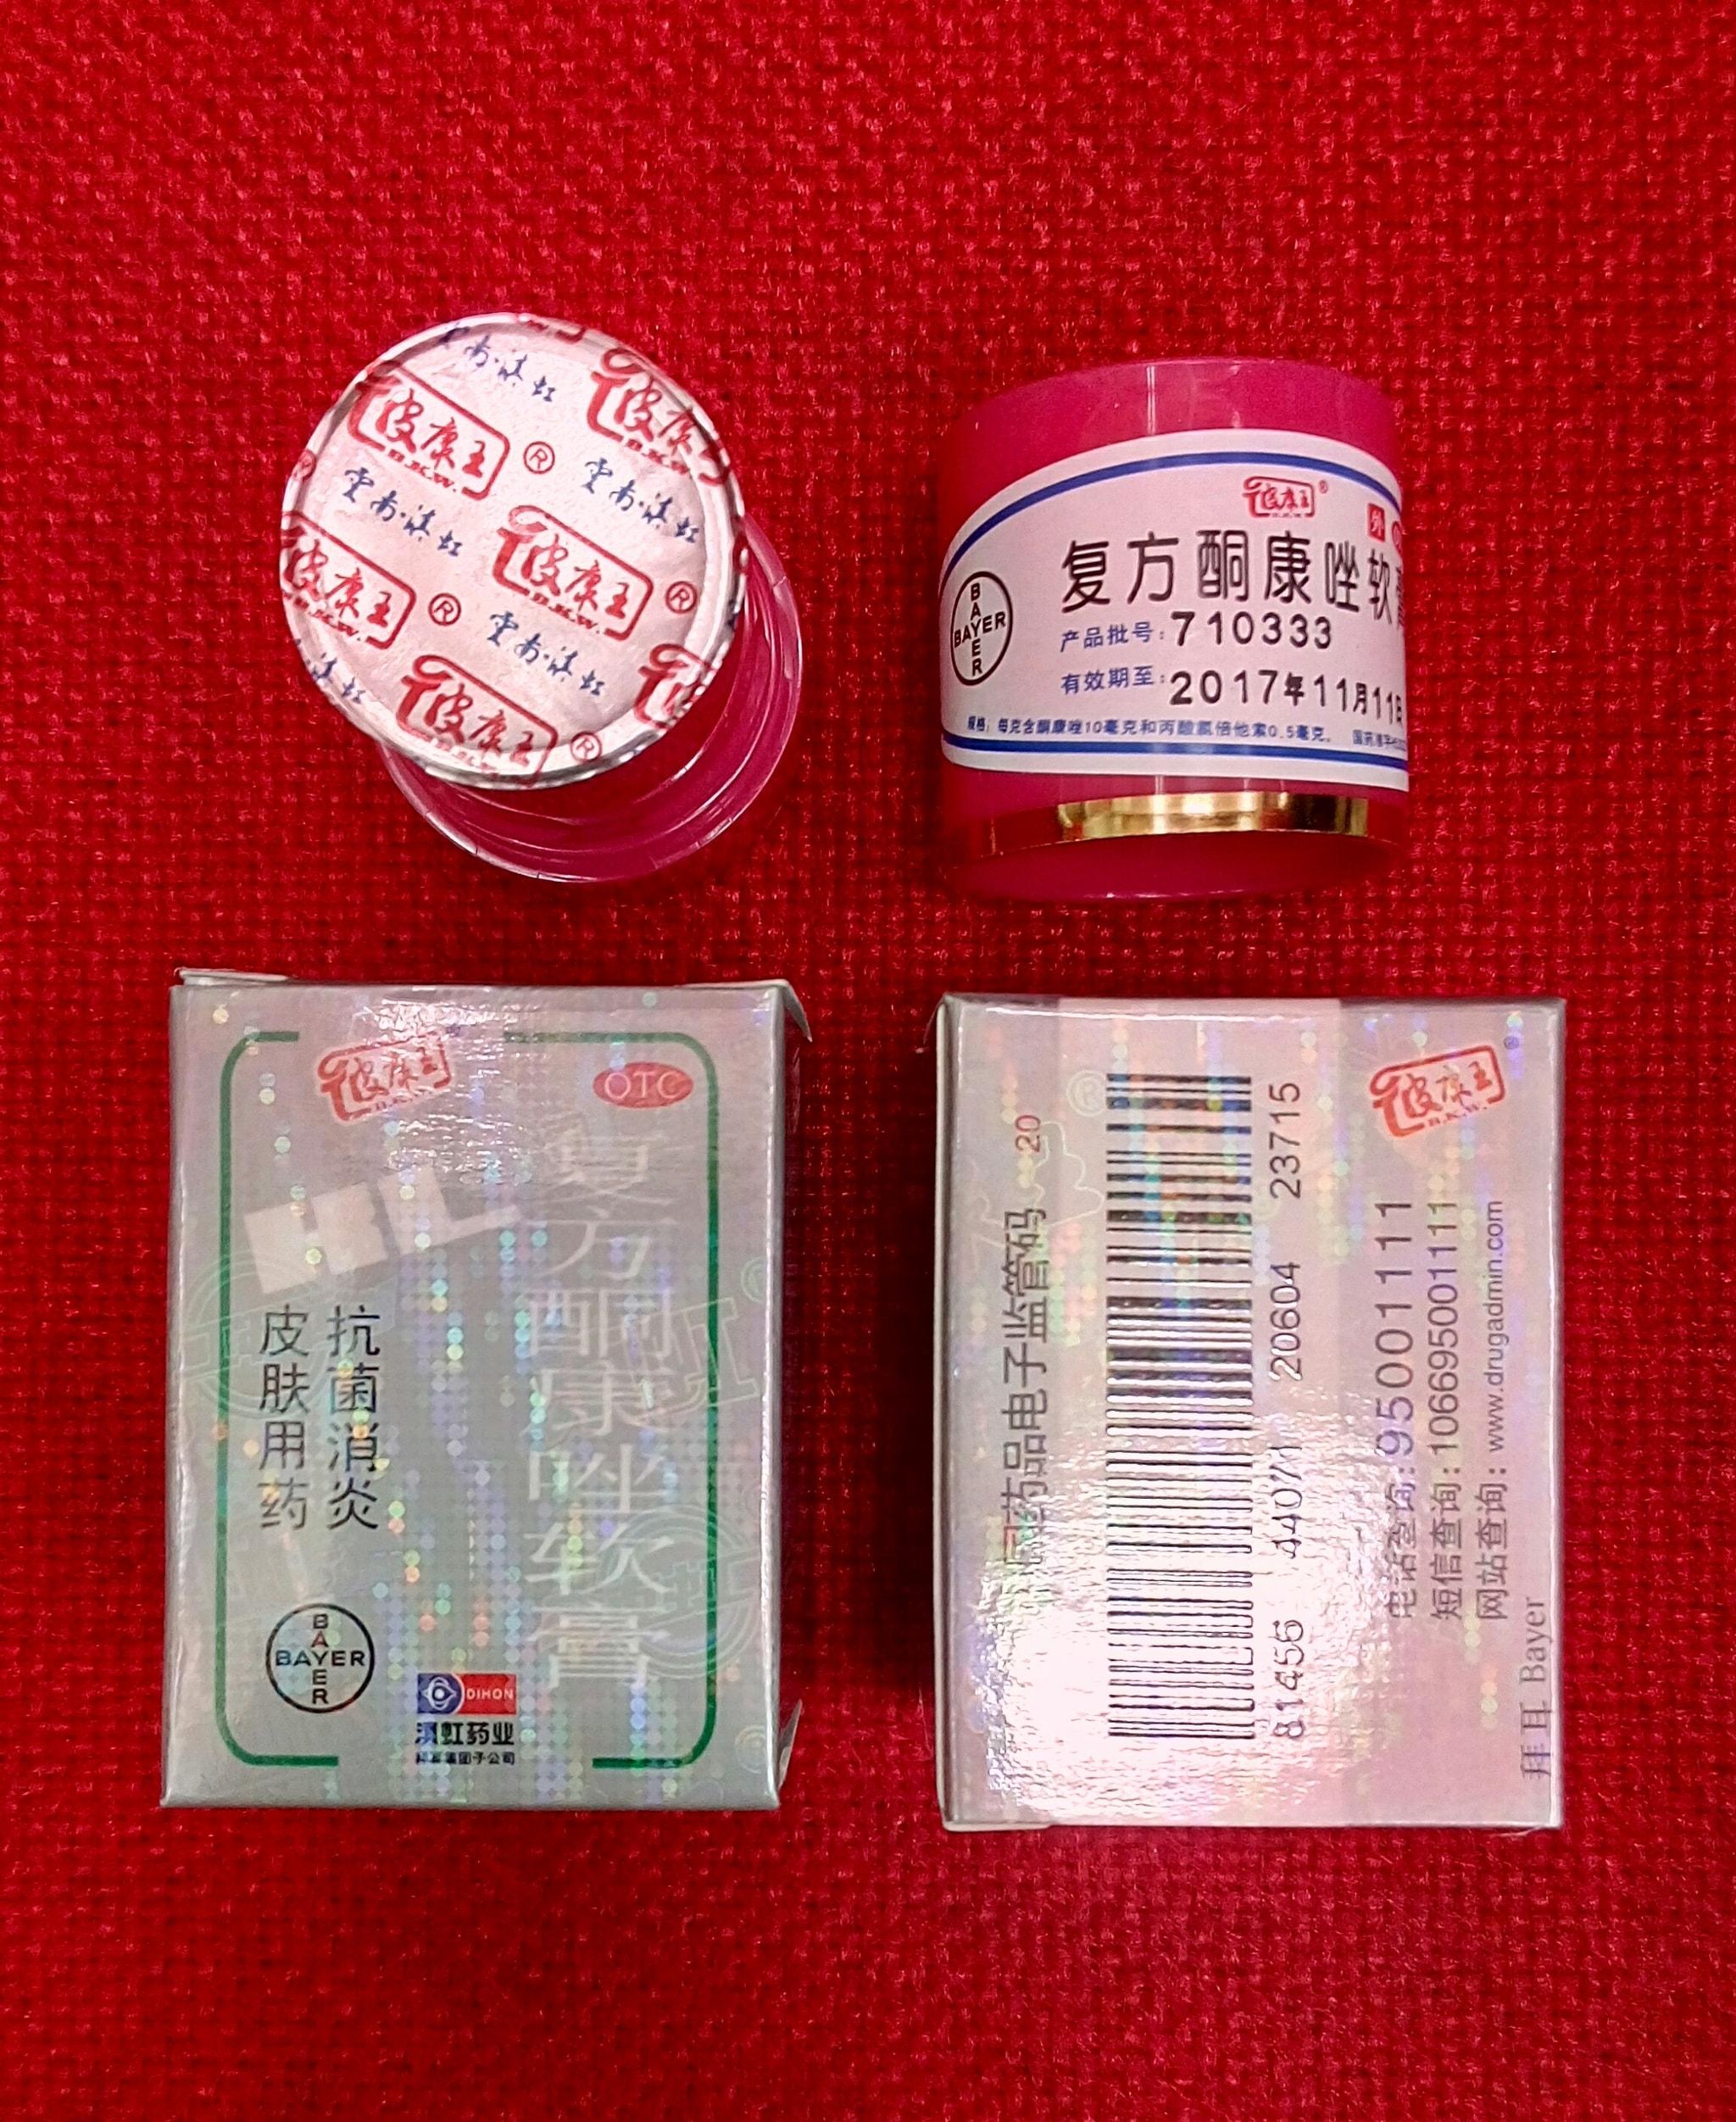 Jual Salep Gatal HL/KL, Pi Kan Wang Cream (Dihon Cream